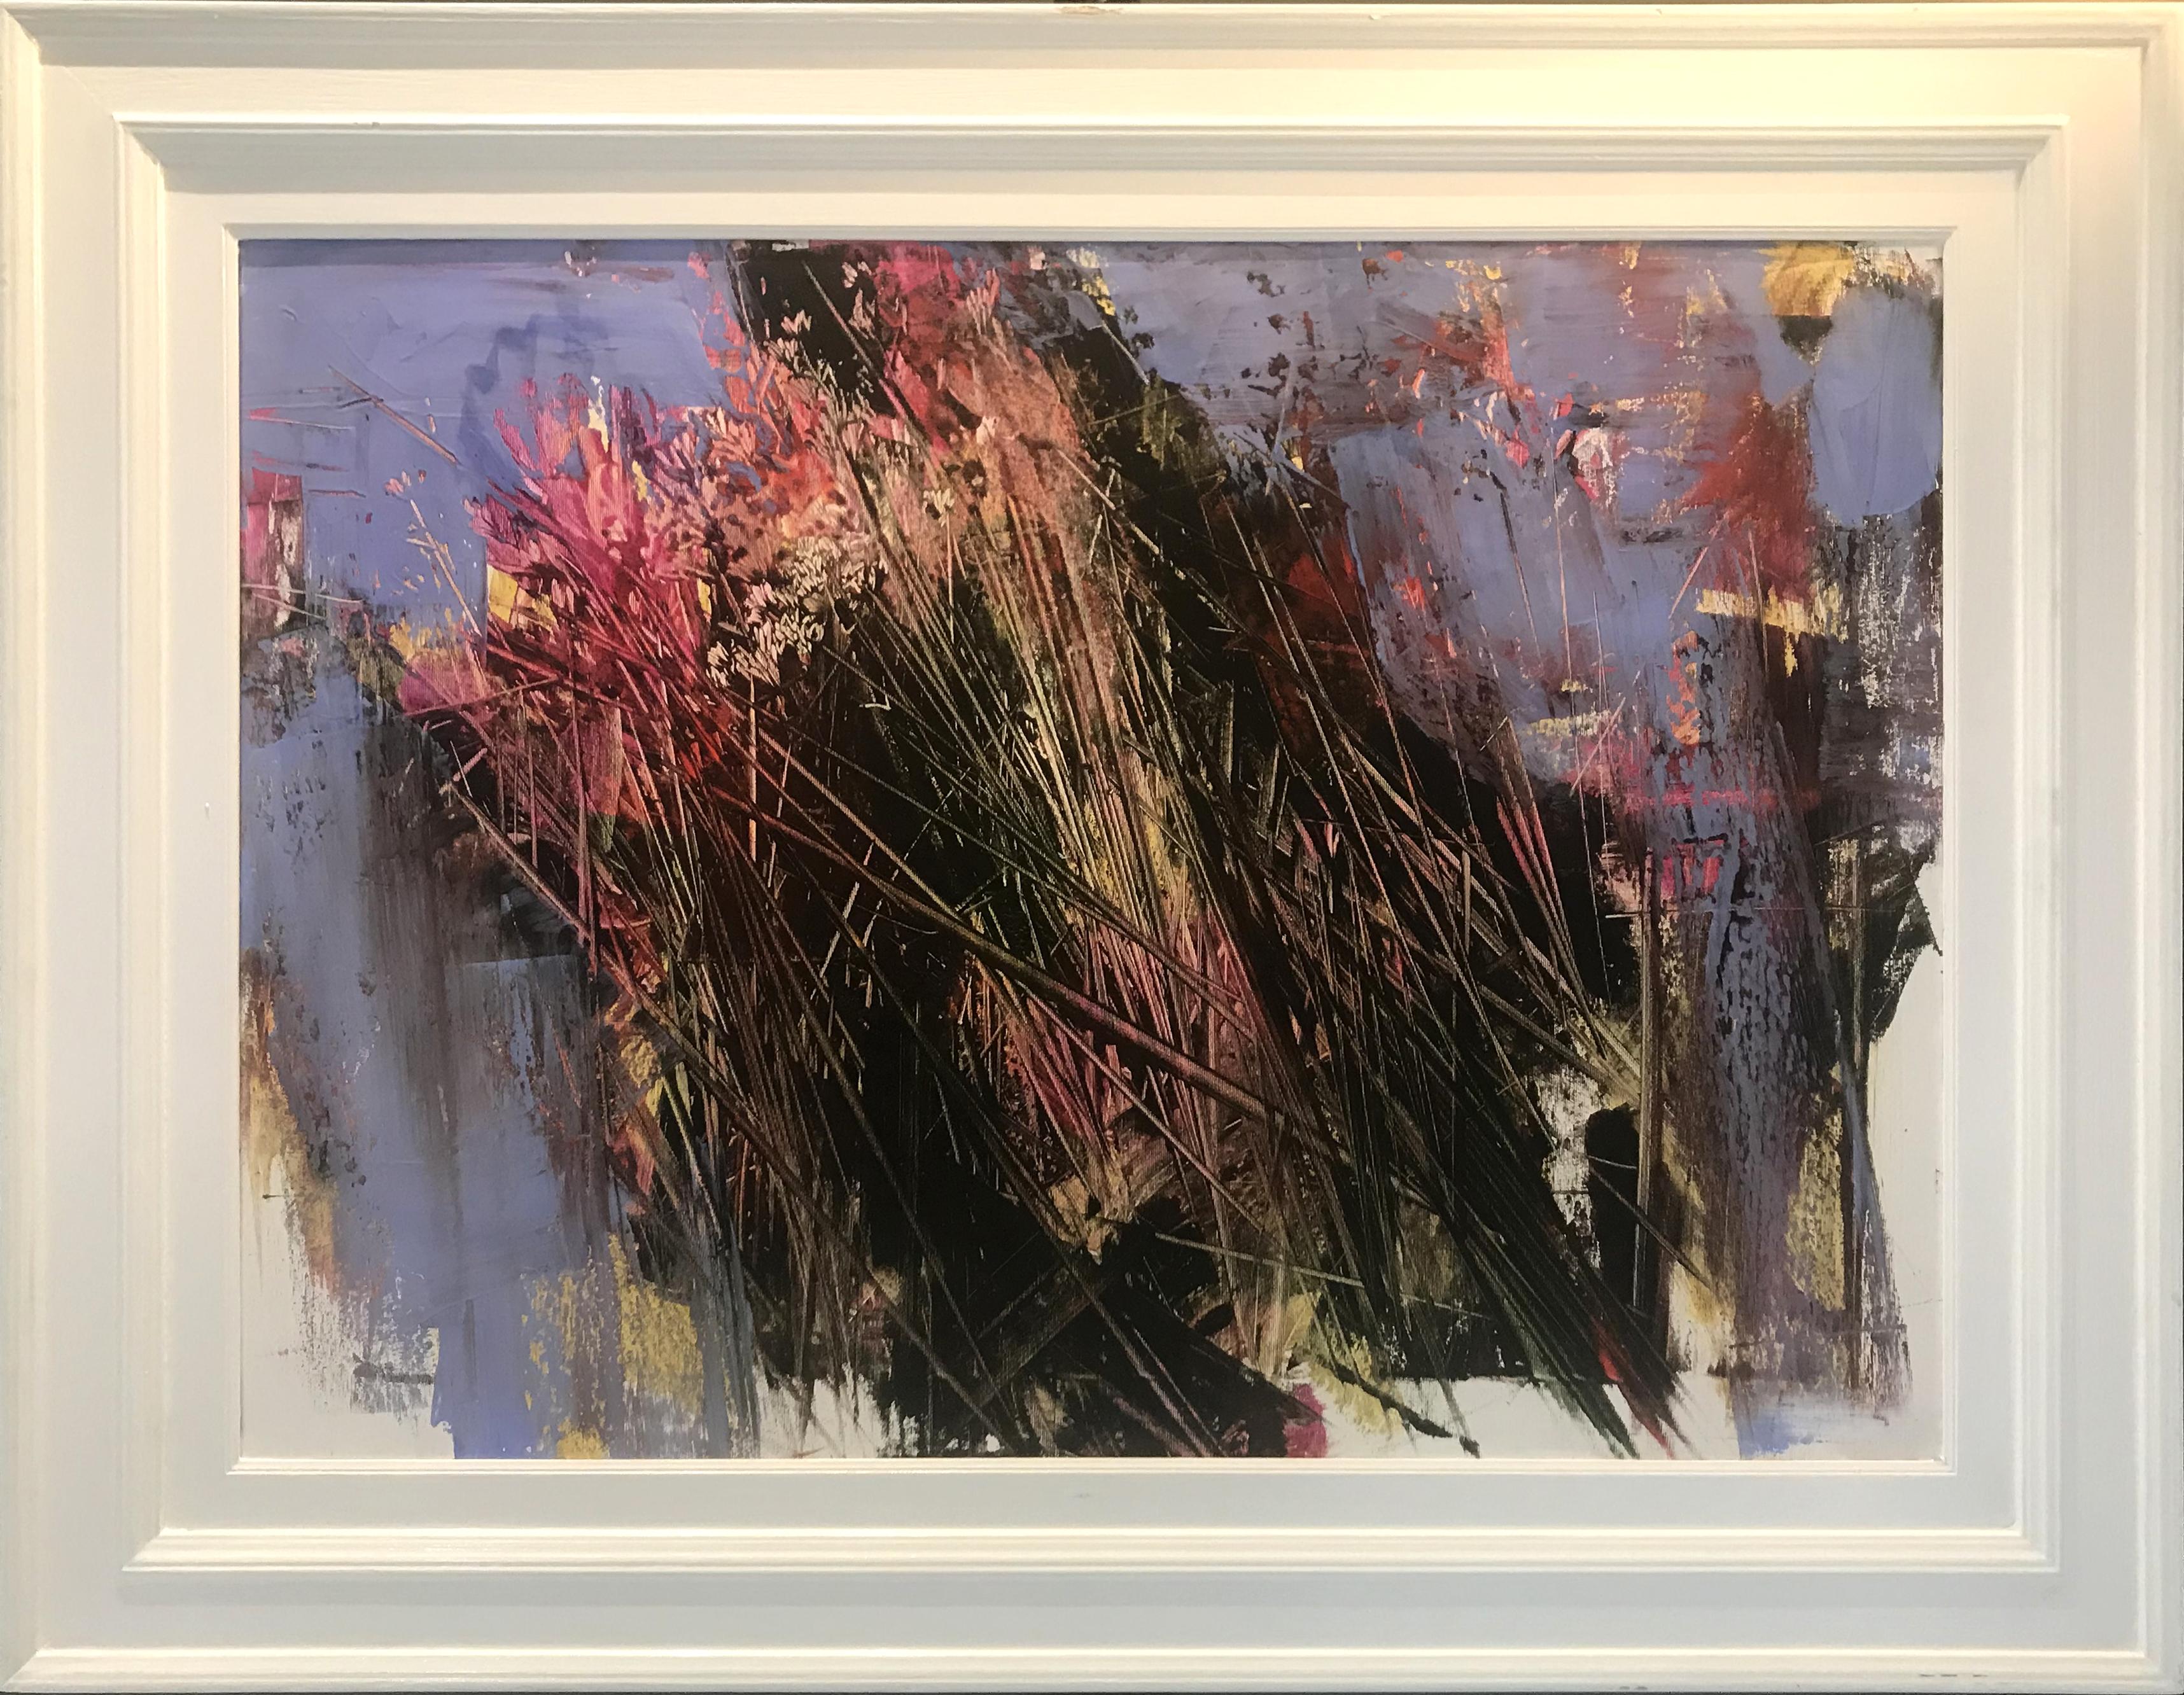 Antonio Pedretti Esplosione floreale